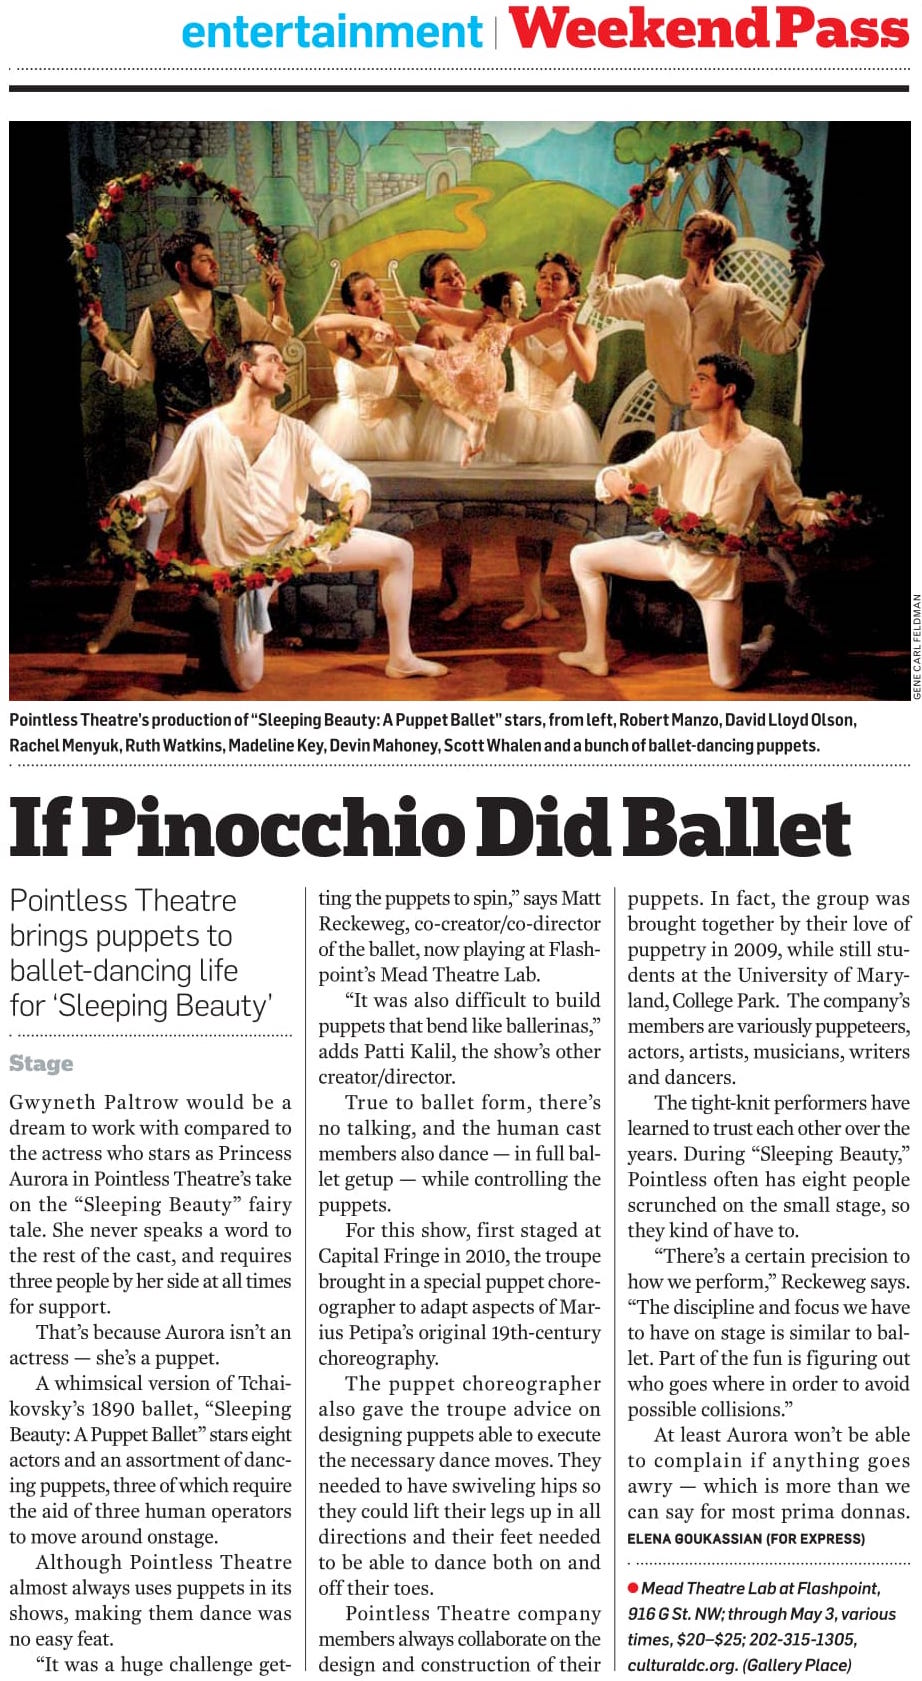 https://www.washingtonpost.com/express/wp/2014/04/16/pointless-theatre-sleeping-beauty-puppet-ballet-mead-flashpoint/